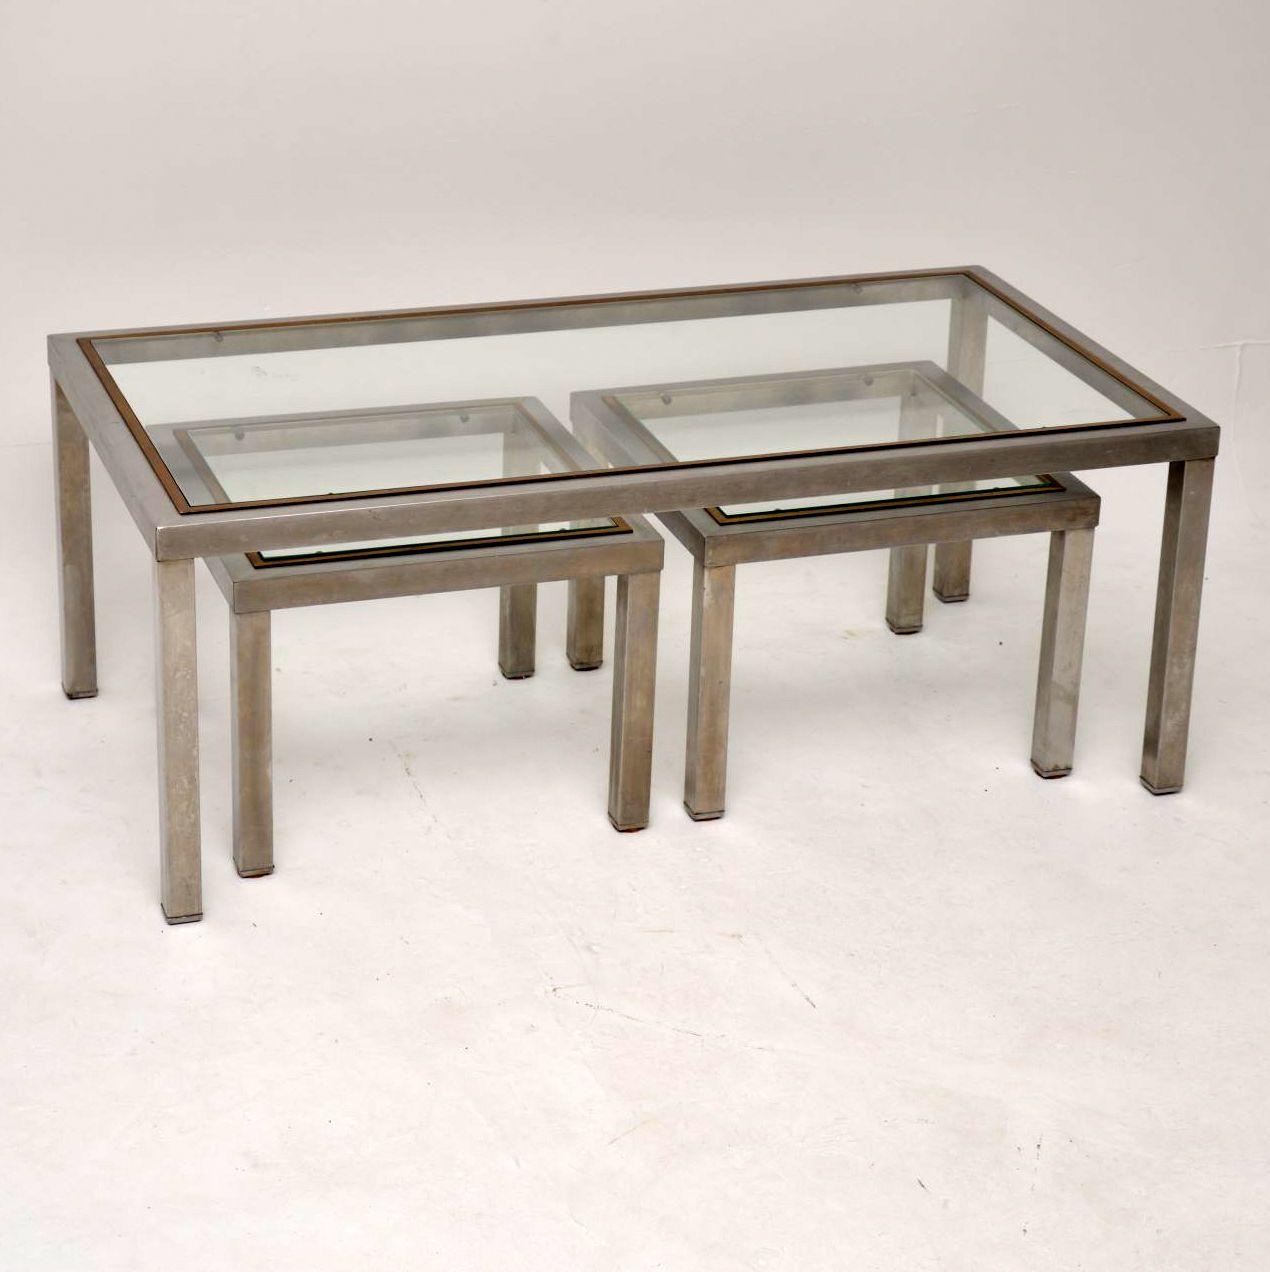 retro_chrome_brass_nestring_coffee_table_1